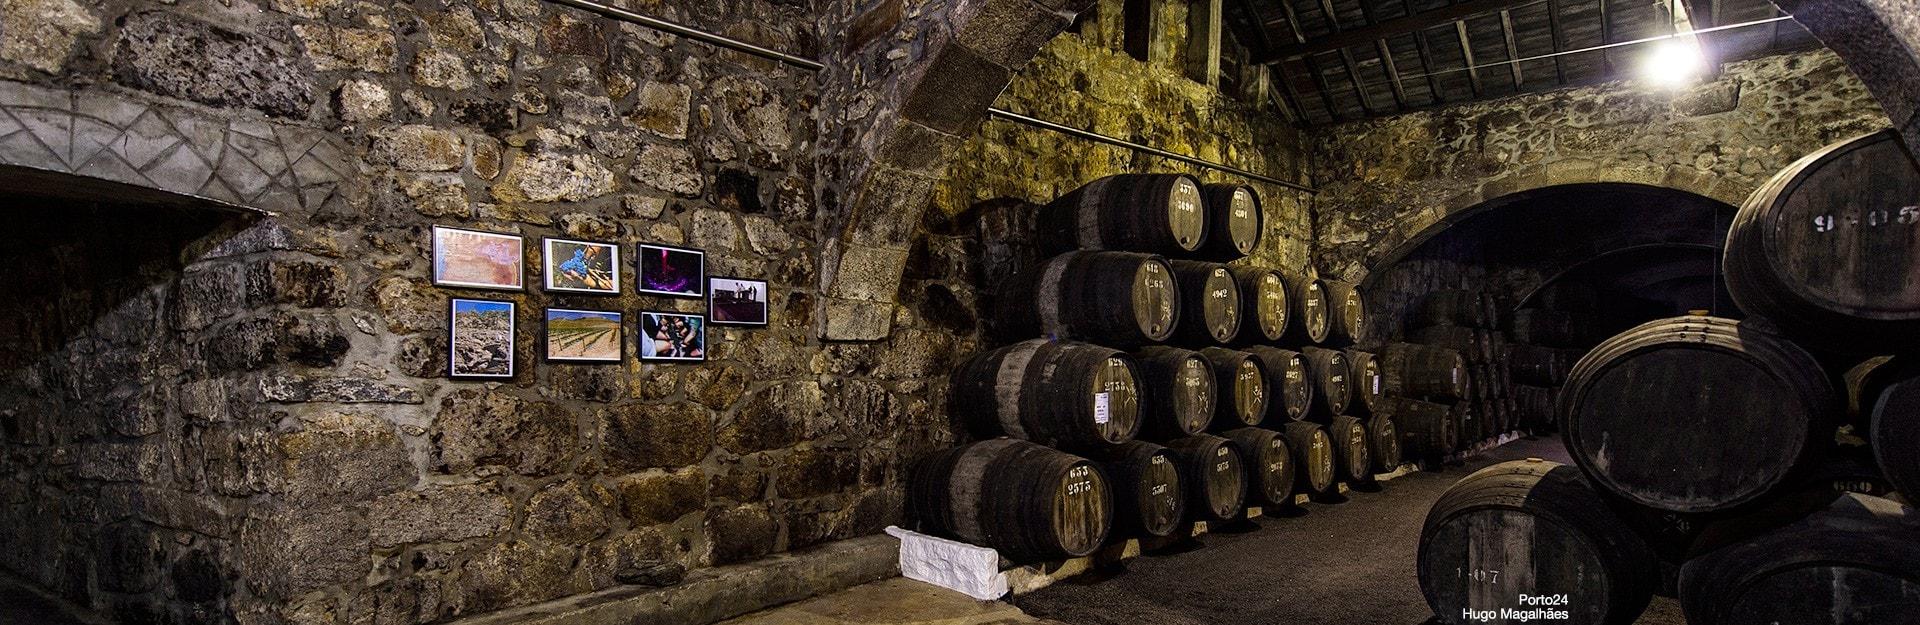 caves-vinhos-helloguide-oporto